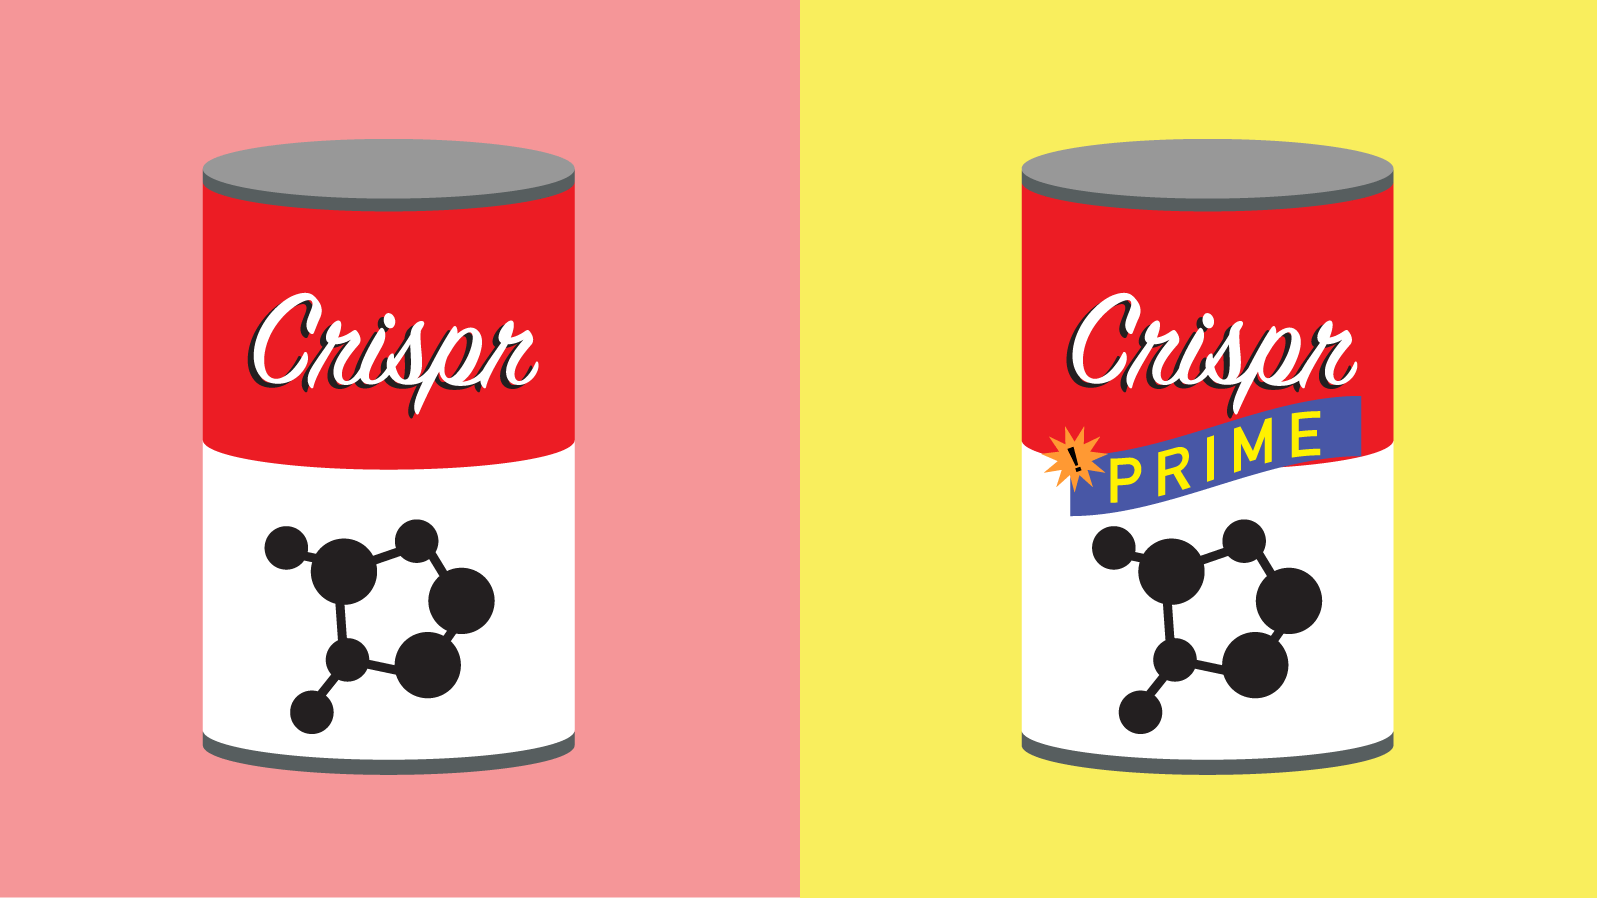 CRISPRの欠点克服へ ハーバード大学が新手法 「プライム編集」を発表